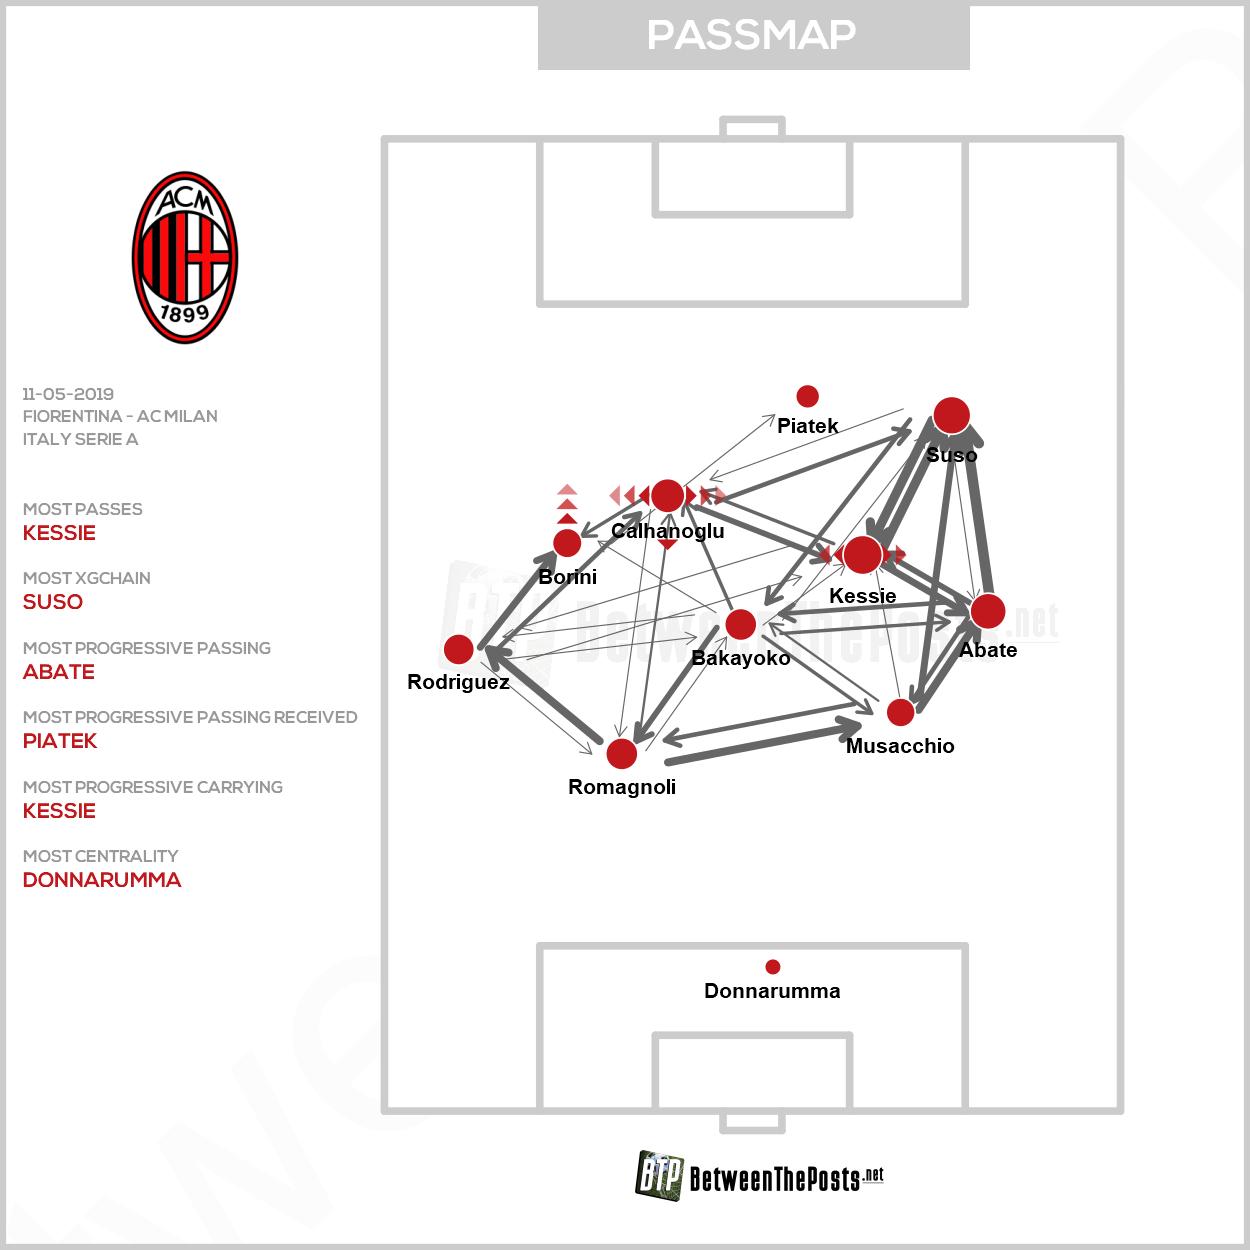 Passmap Fiorentina - AC Milan 0-1 Serie A